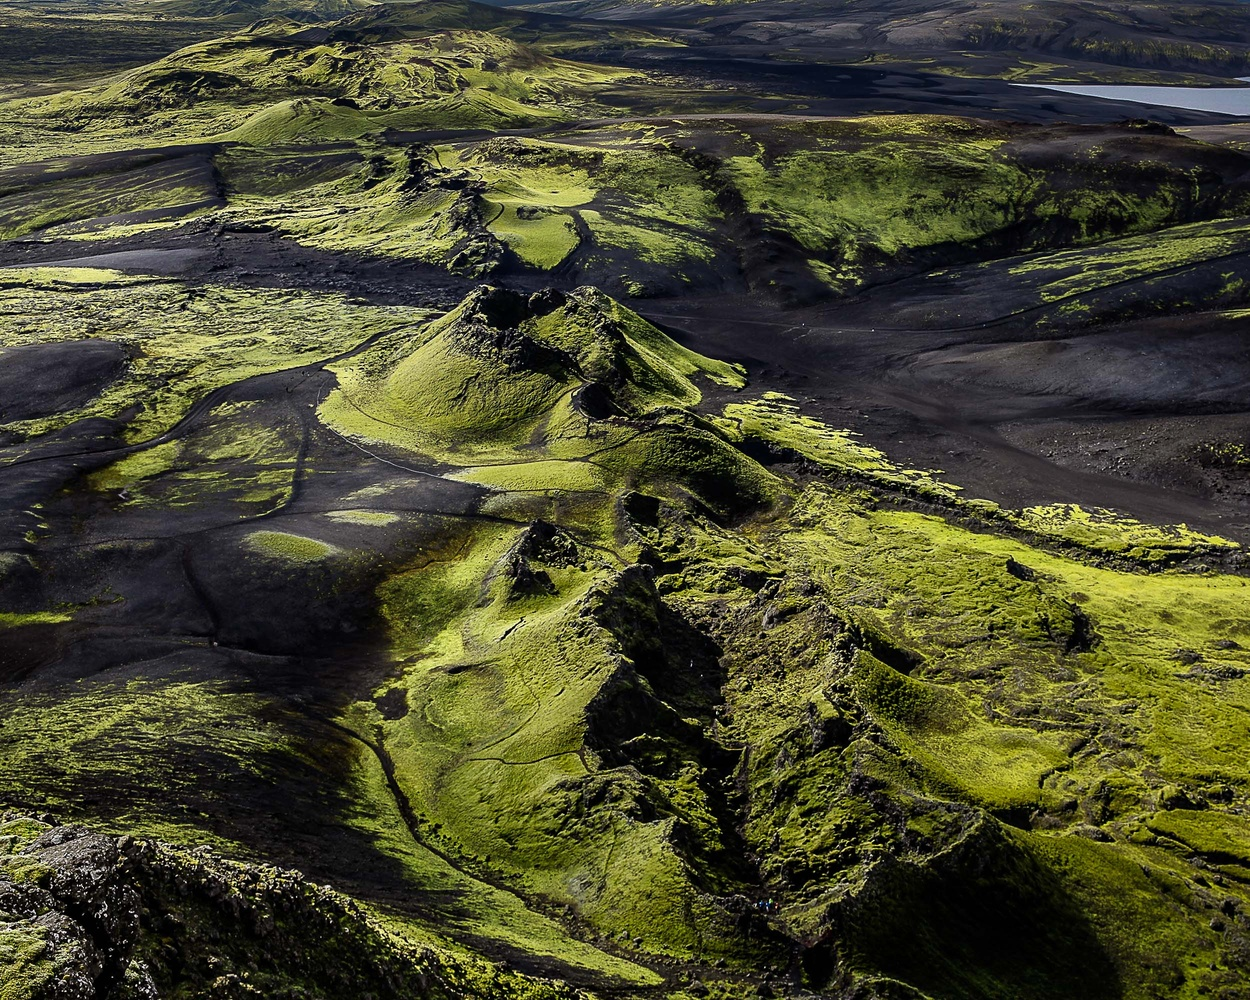 Laki (Iceland) by david huguet